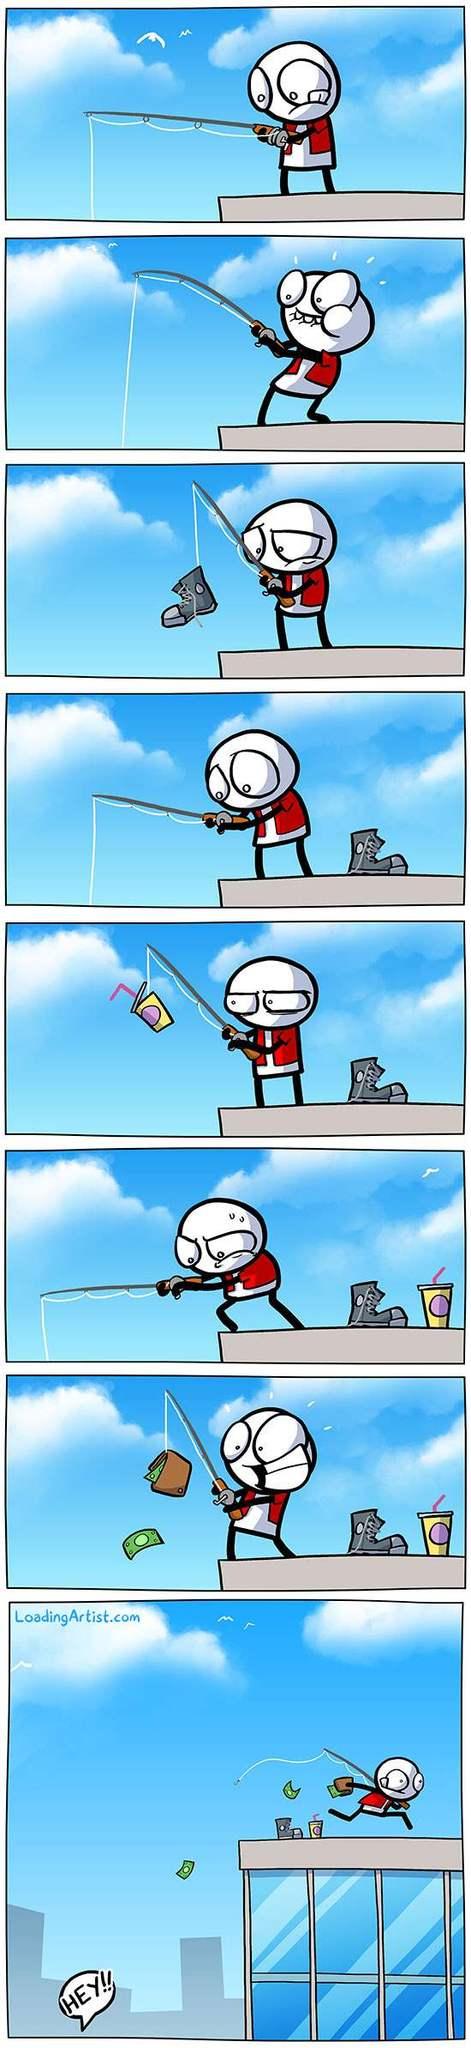 Pesca de altura - meme